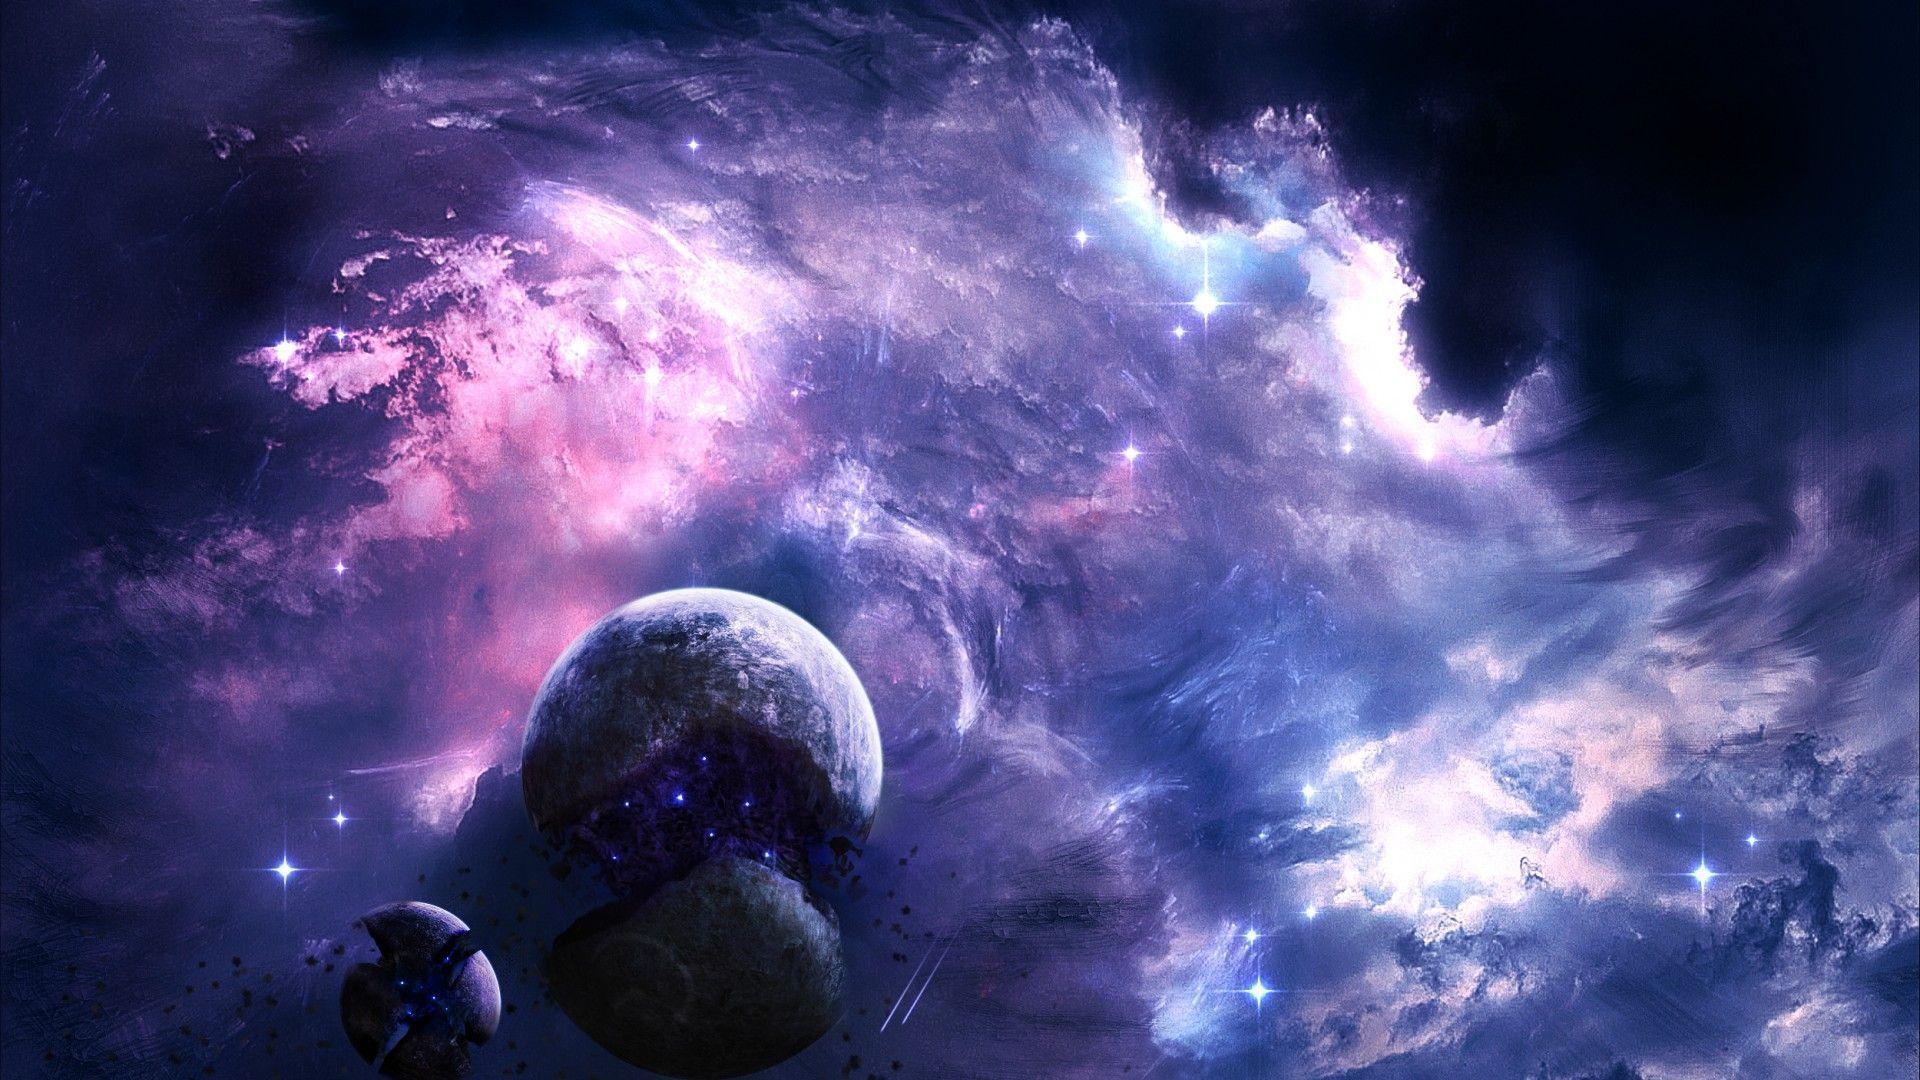 Cool Space Desktop Wallpapers Top Free Cool Space Desktop Backgrounds Wallpaperaccess